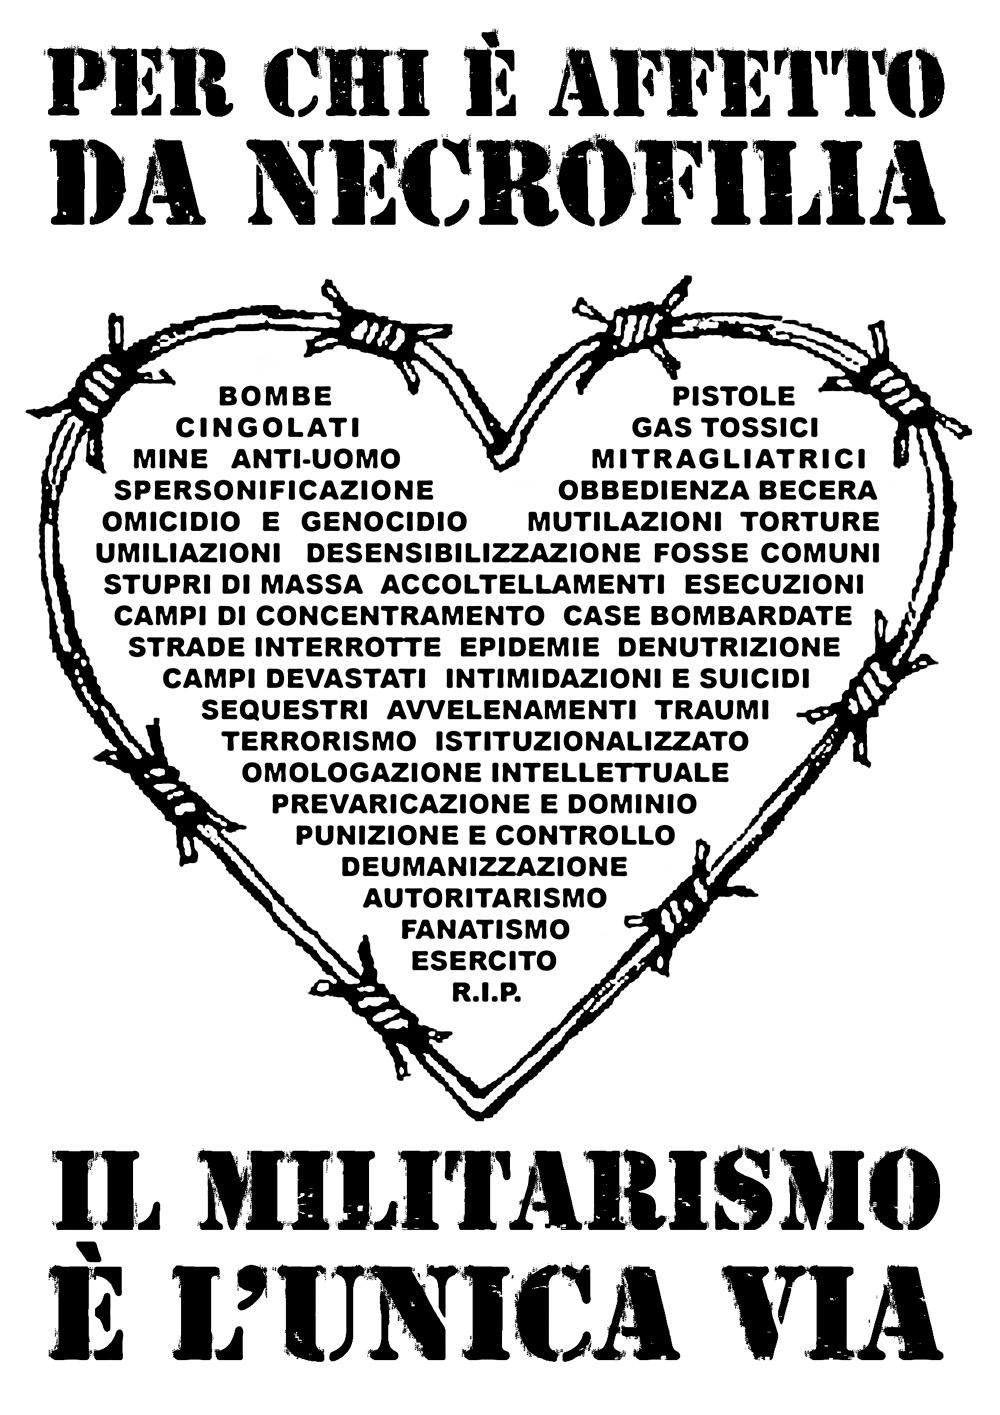 militarismo & necrofilia #2 - graficanera - NO COPYRIGHT